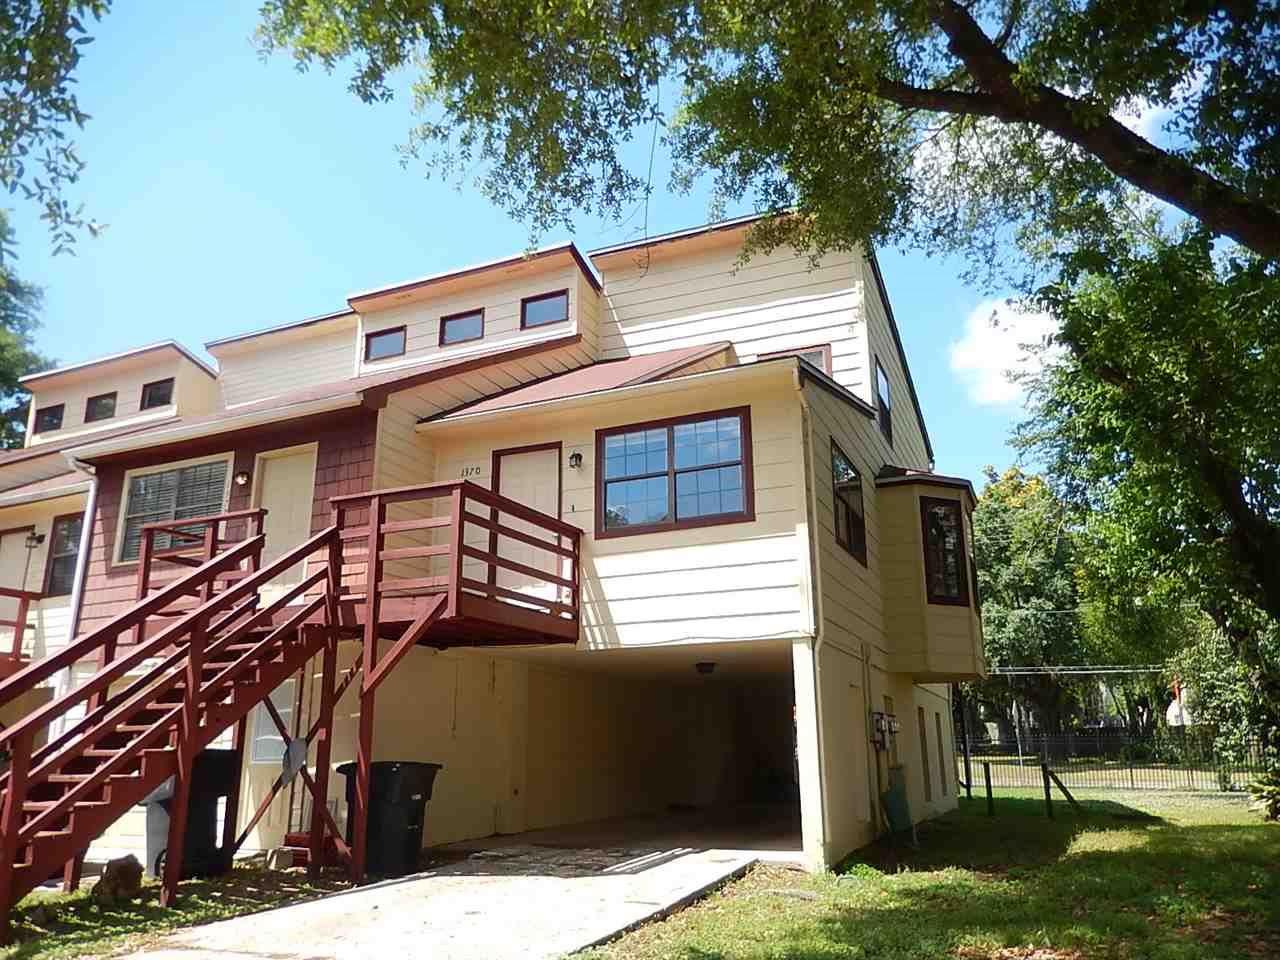 1370 Warrior Way, Tallahassee, FL 32304 - MLS#: 330641